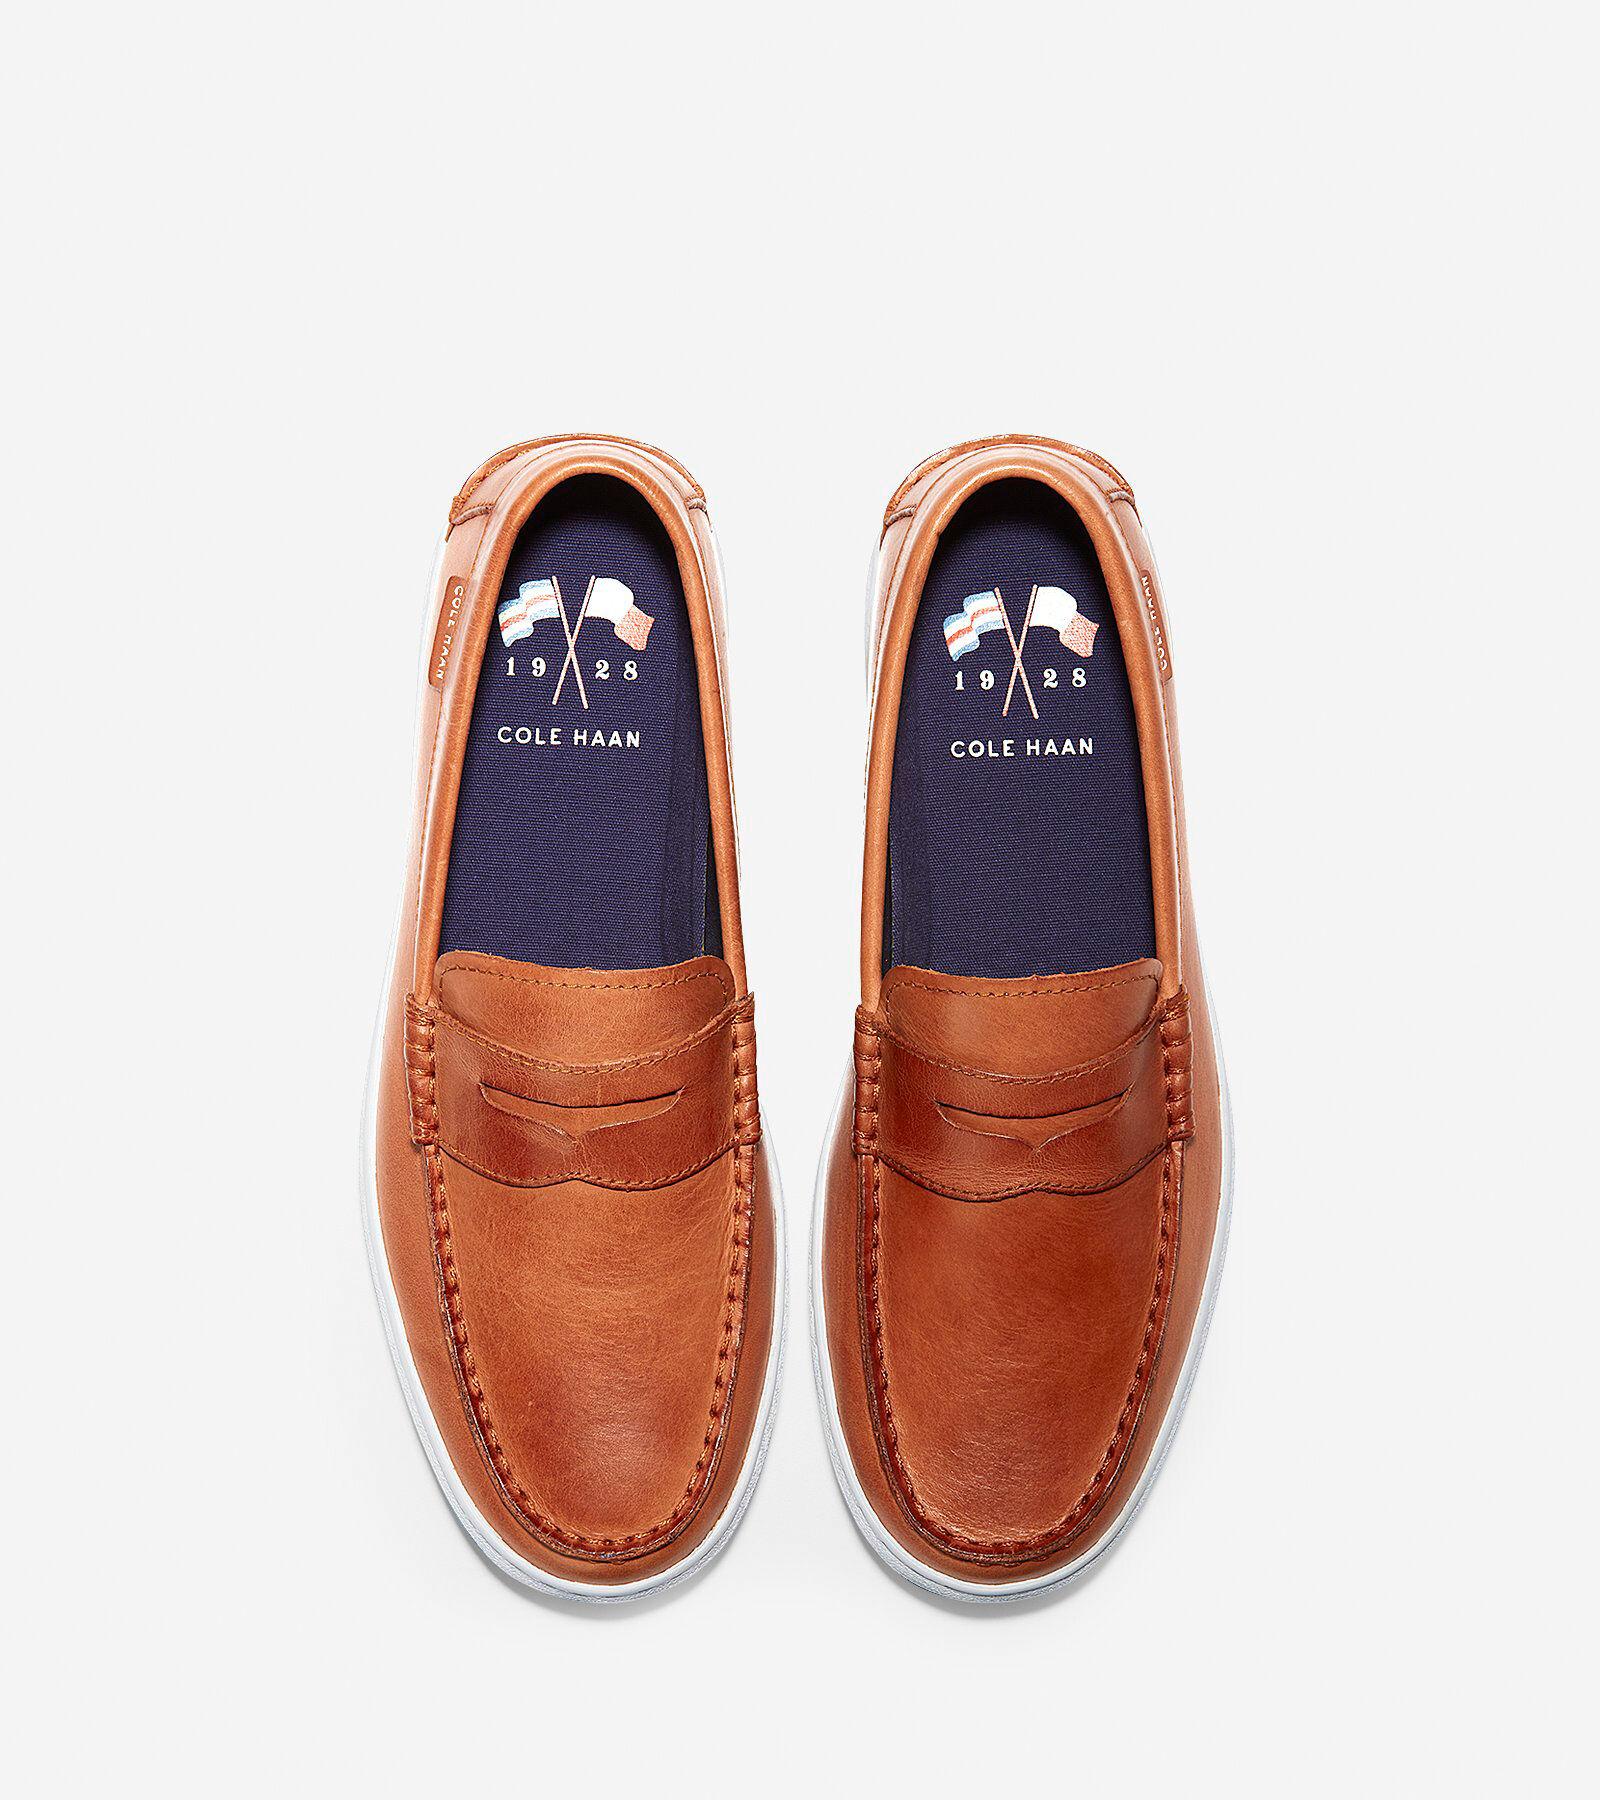 Men's Nantucket Loafer · Men's Nantucket Loafer · Men's Nantucket Loafer · Men's  Nantucket Loafer. #colehaan